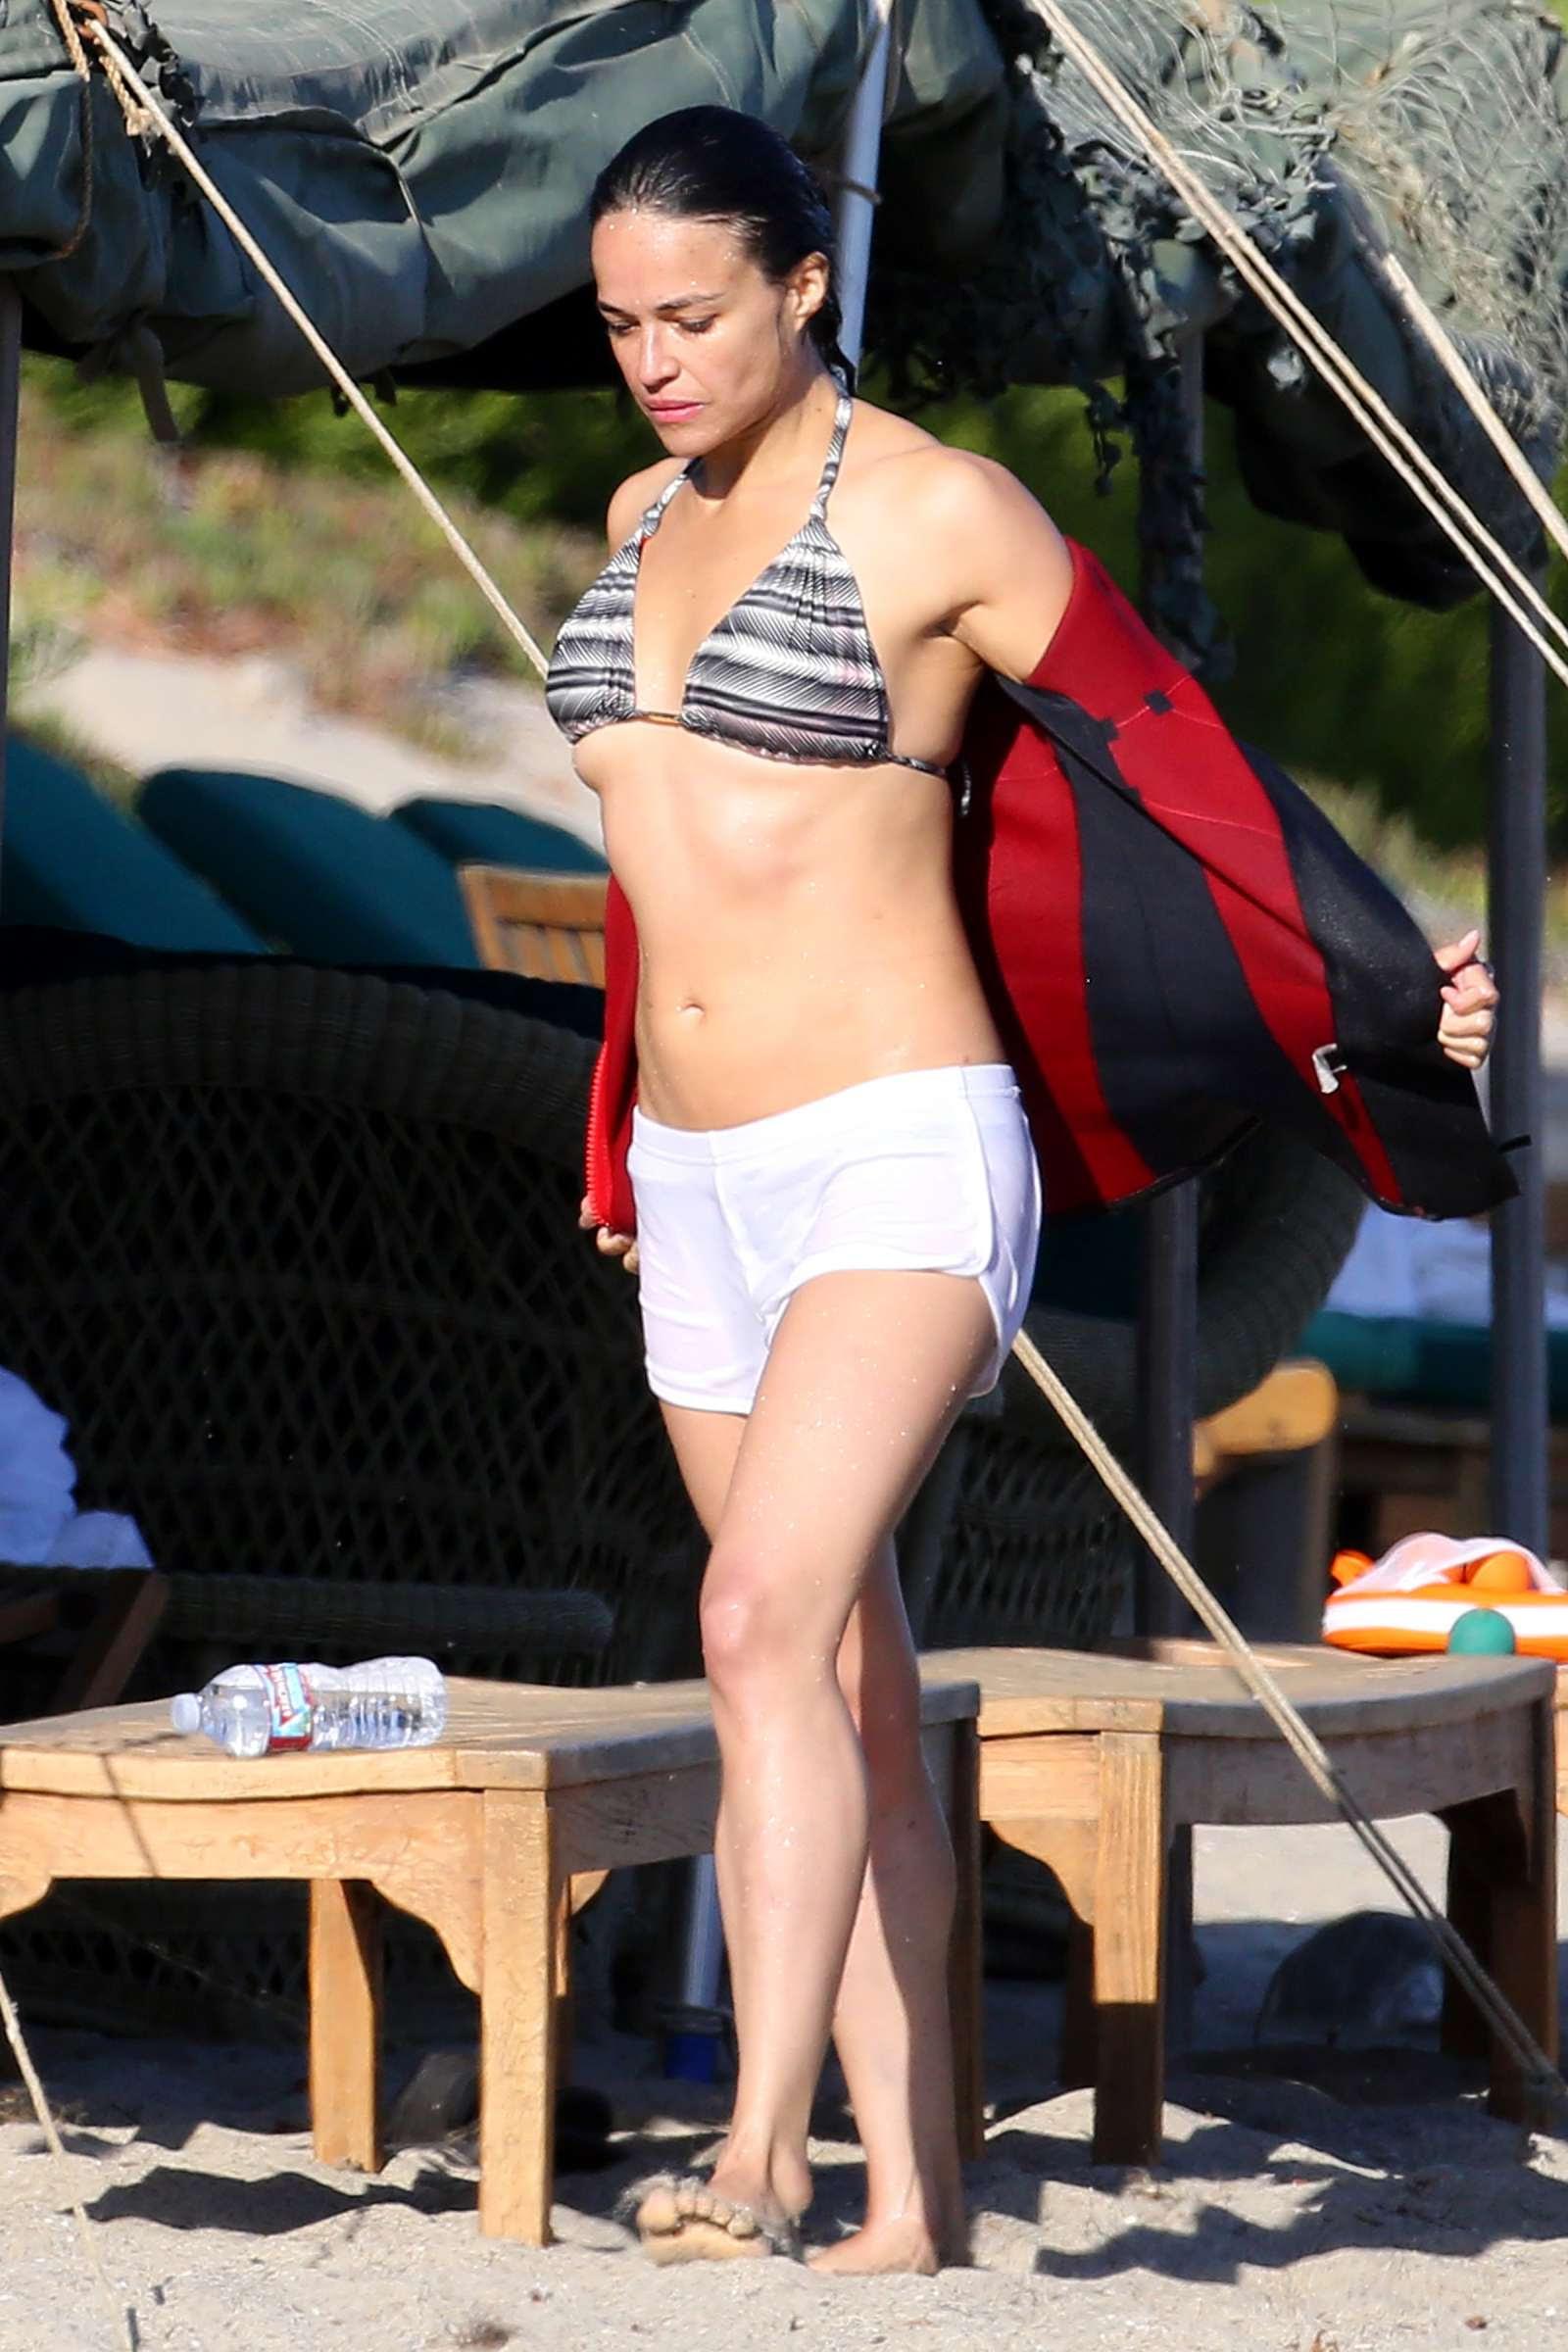 Michelle Rodriguez in Bikini Top on a jet ski in Malibu